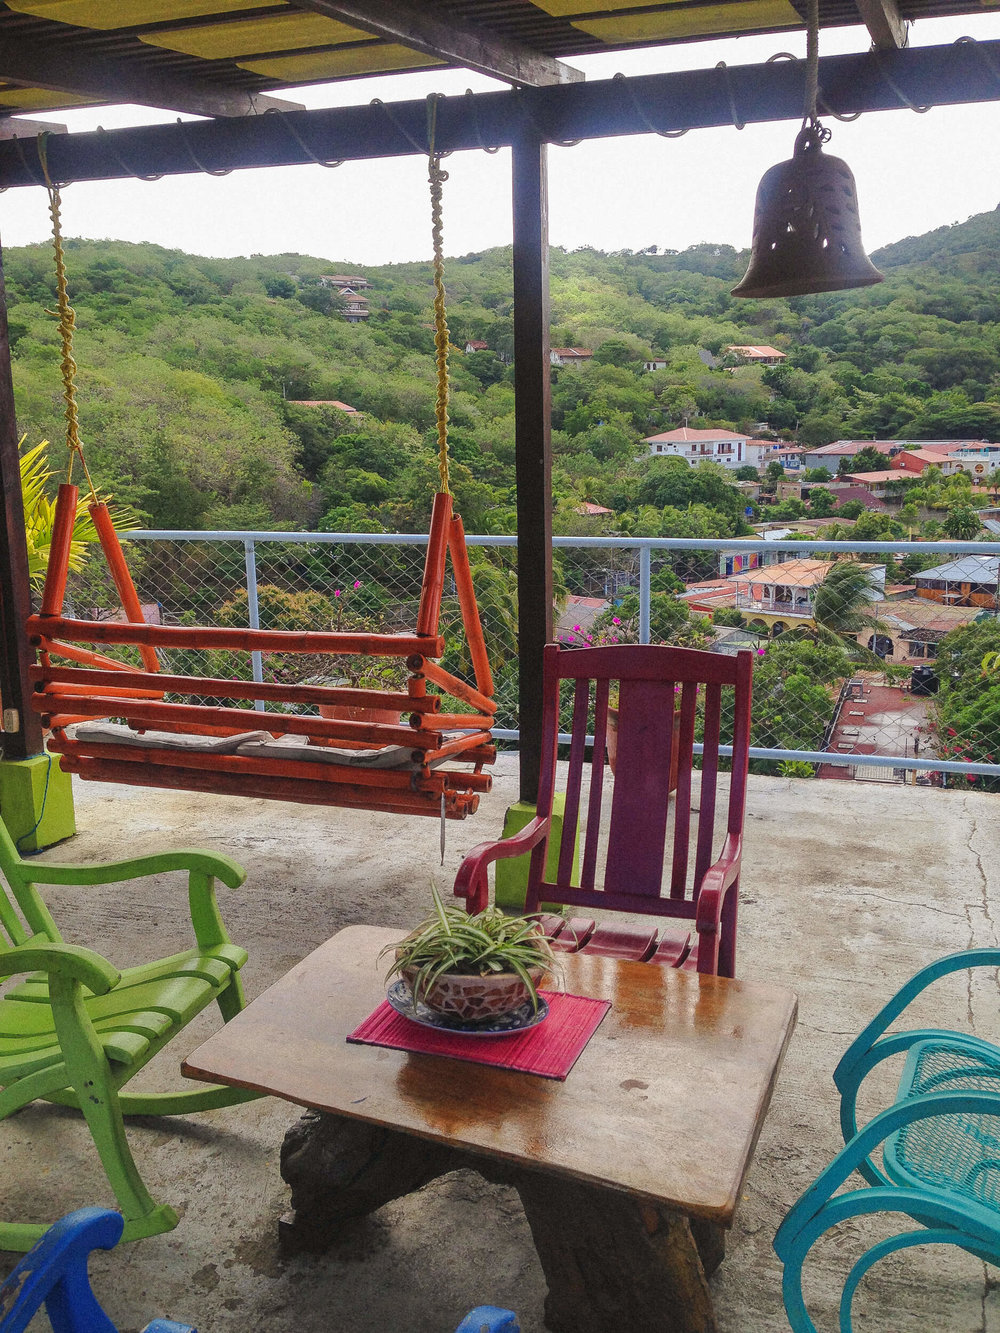 Hotel Maracuya Nicaragua San Juan del Sur - ochristine -4.jpg